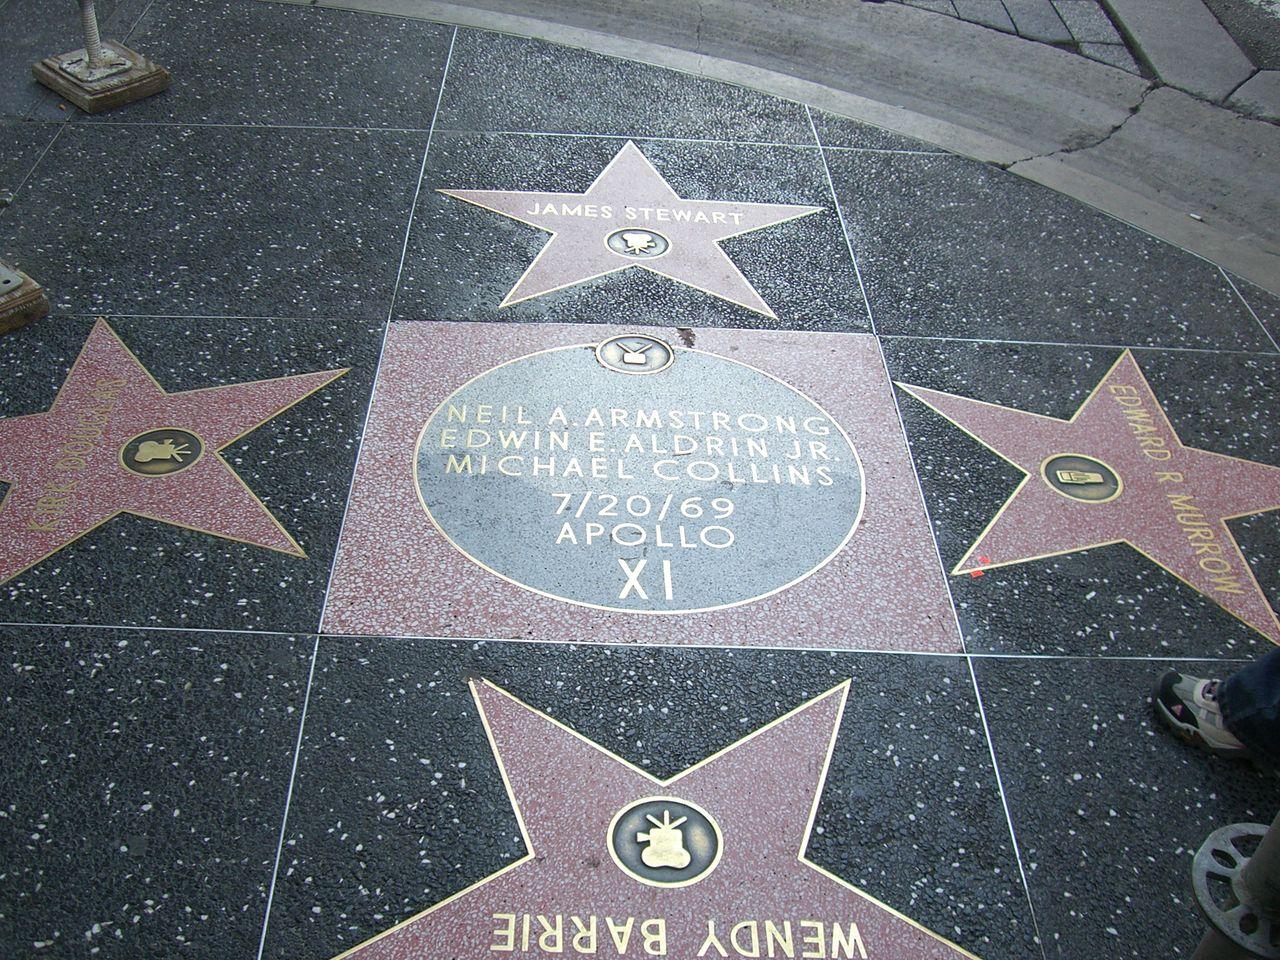 Аллея звезд Голливуда, знак Аполлона 11